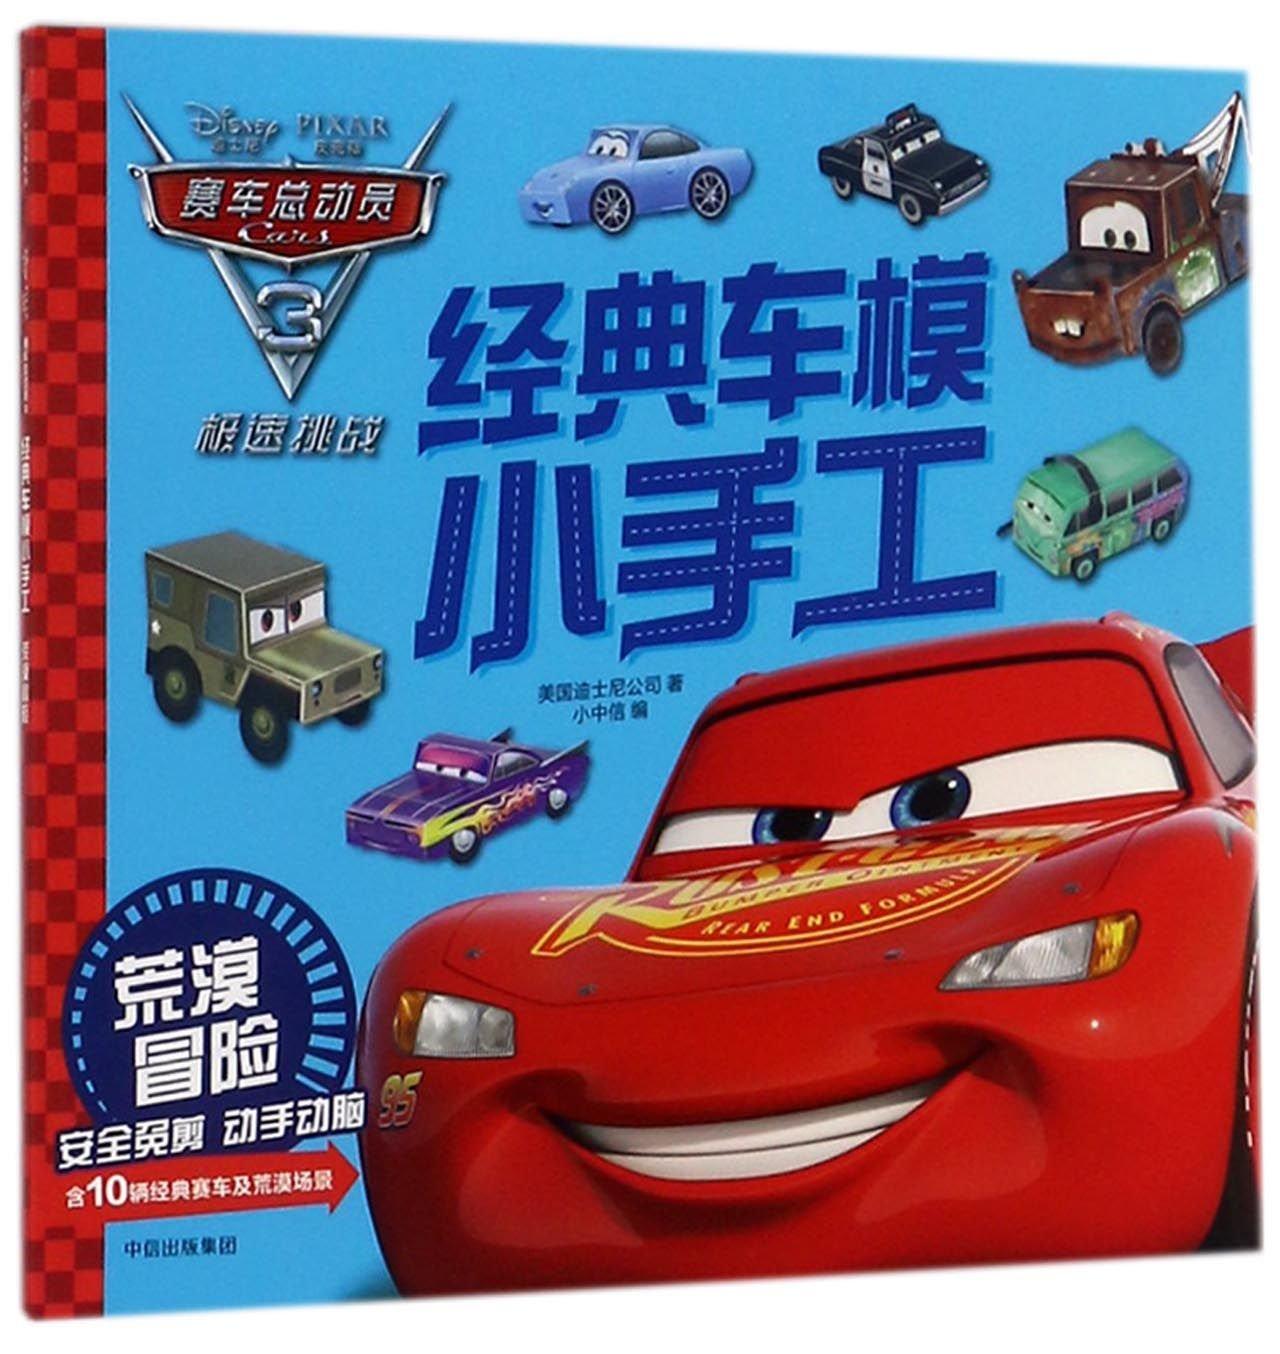 Disney Pixar Cars 3 Desert Race Die Cast Chinese Edition The